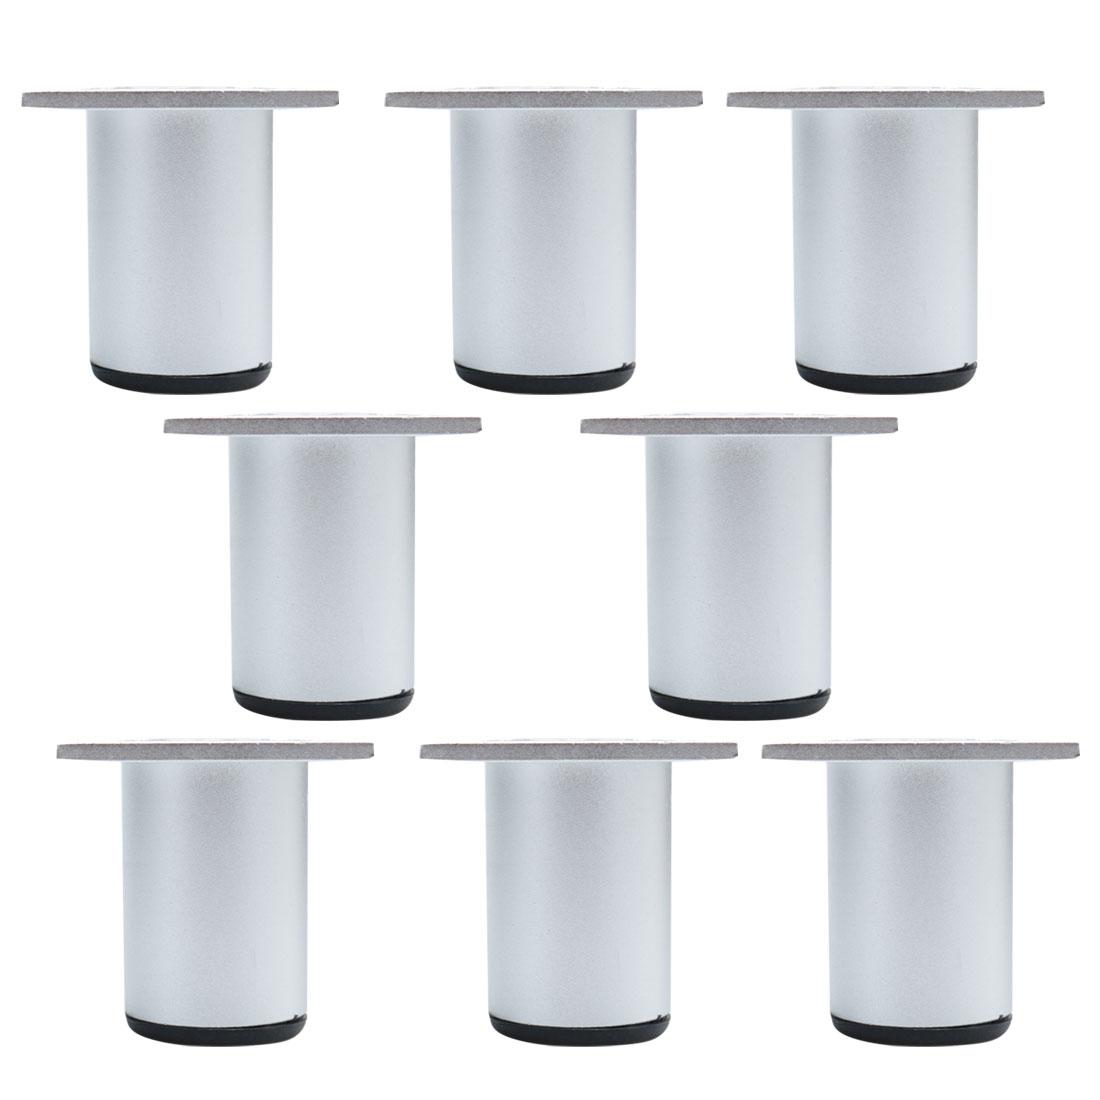 "2.4"" Furniture Legs Aluminium Alloy Sofa Table Replacement Height Adjuster 8pcs"